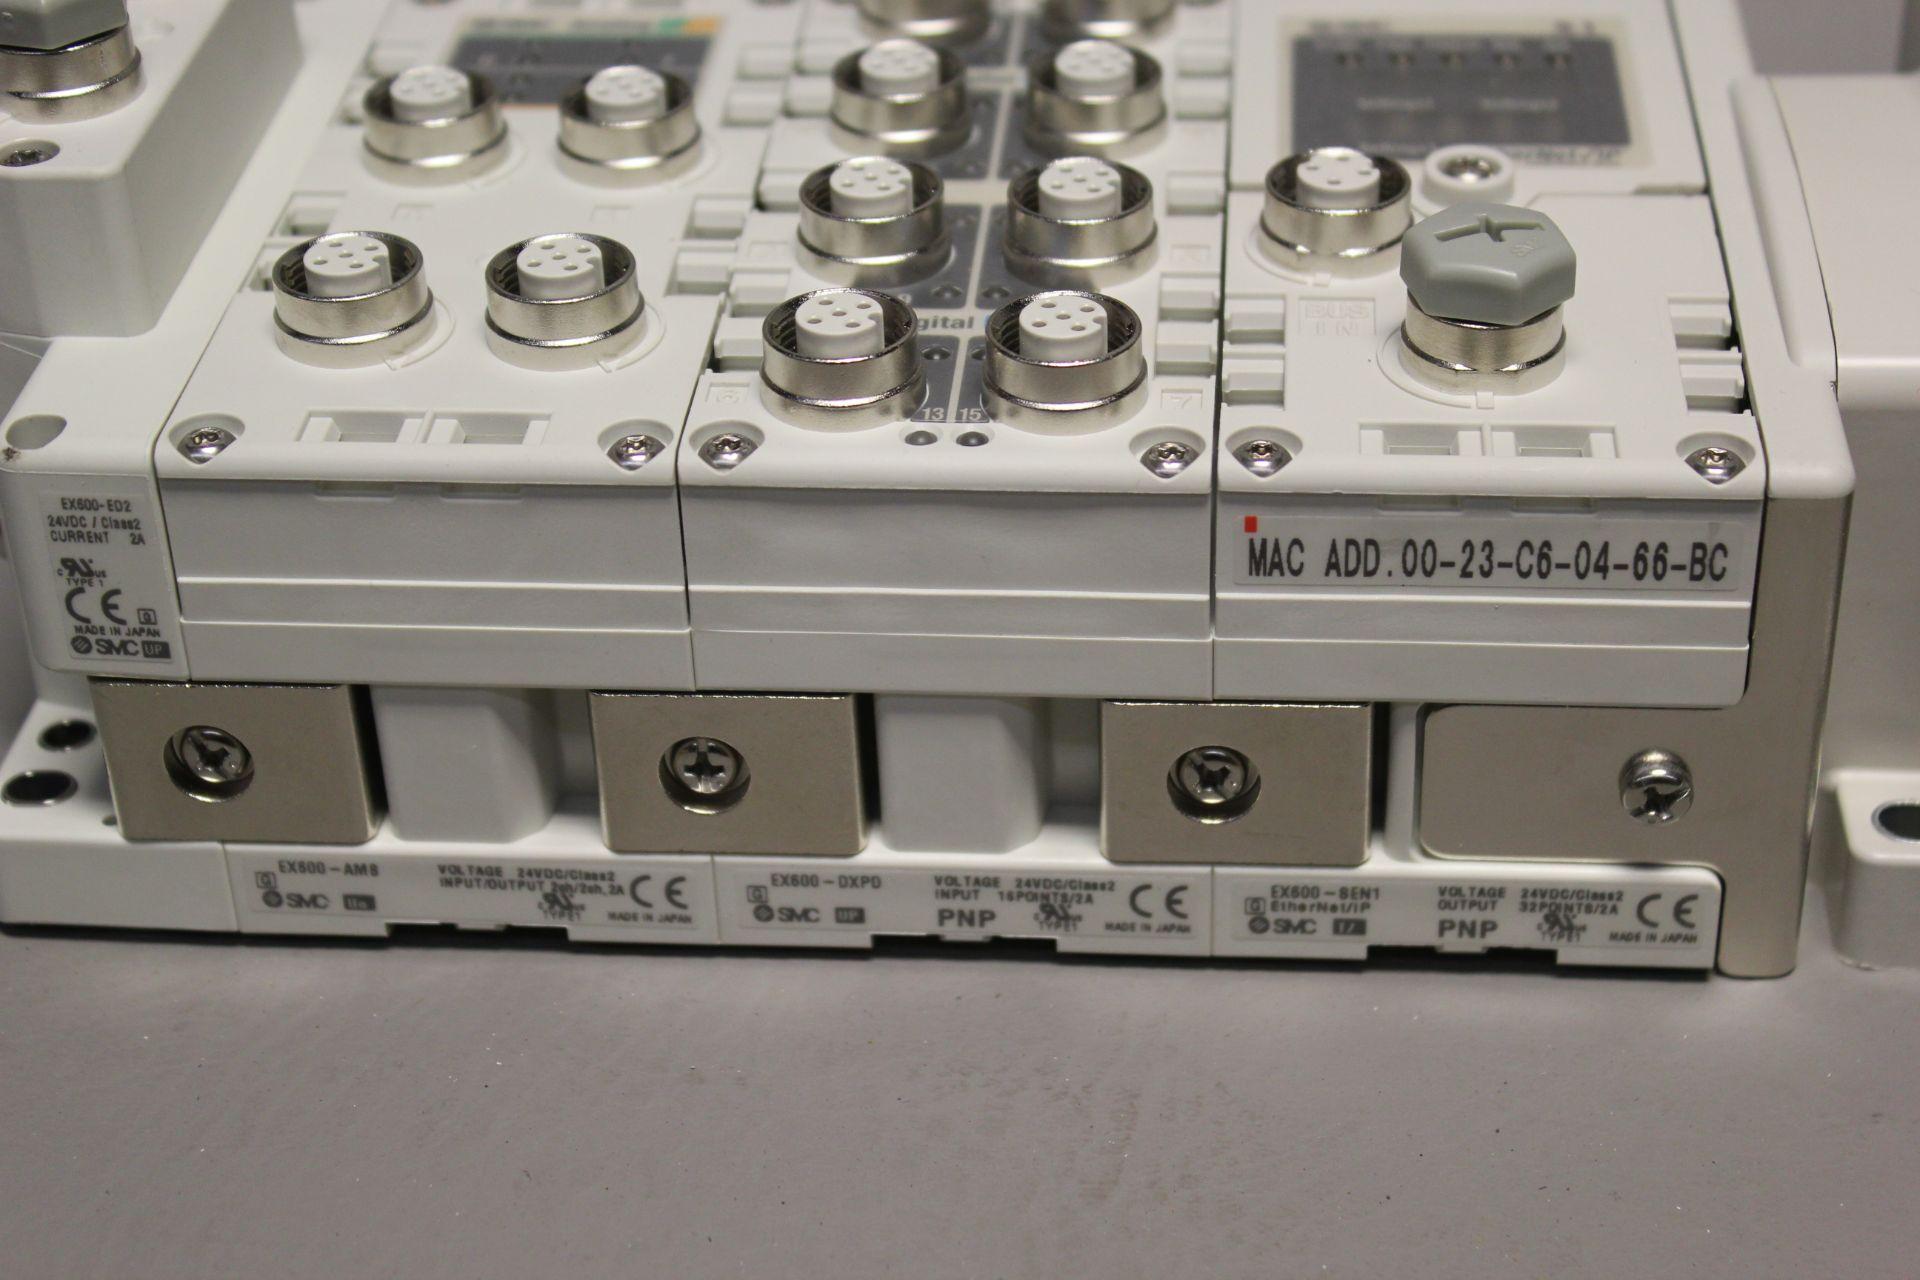 NEW SMC MANIFOLD WITH SOLENOID VALVES, ETHERNET/IP I/O - Image 3 of 8